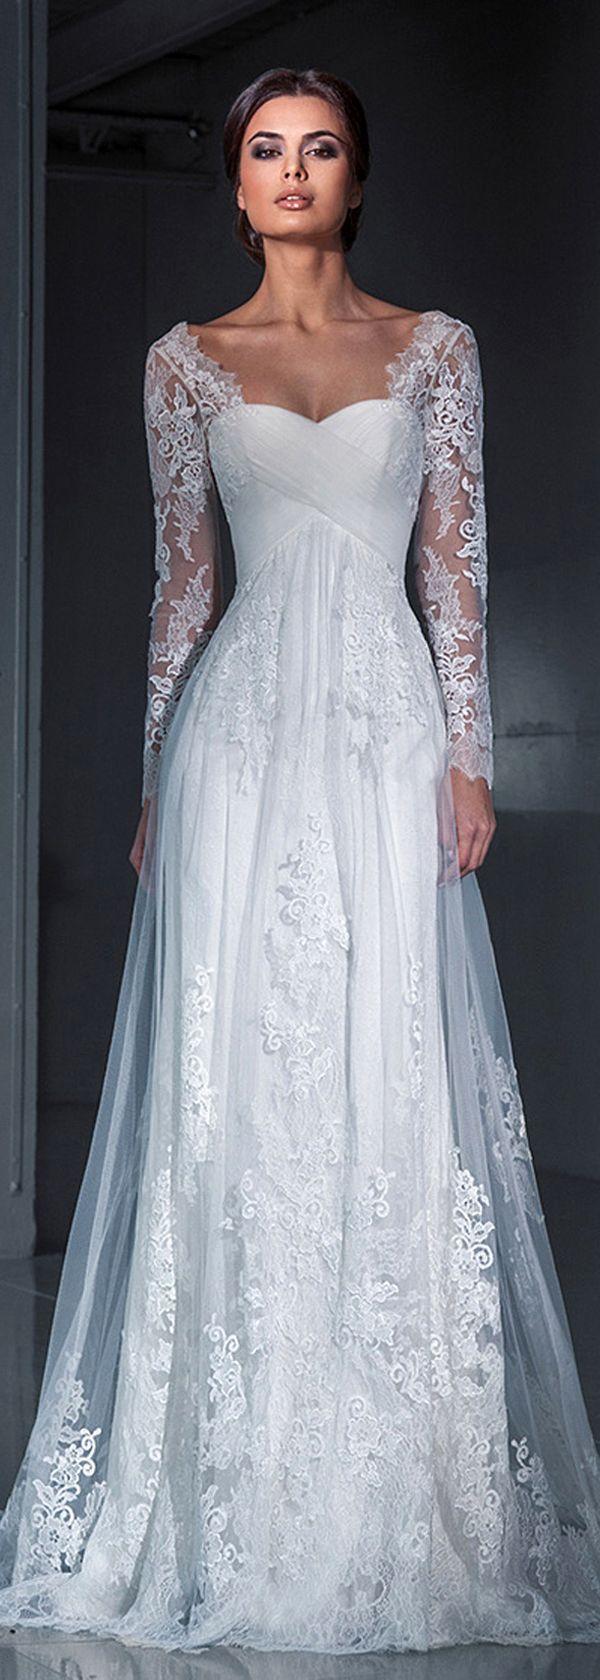 Vestidos Vestidos | Vestidos | Pinterest